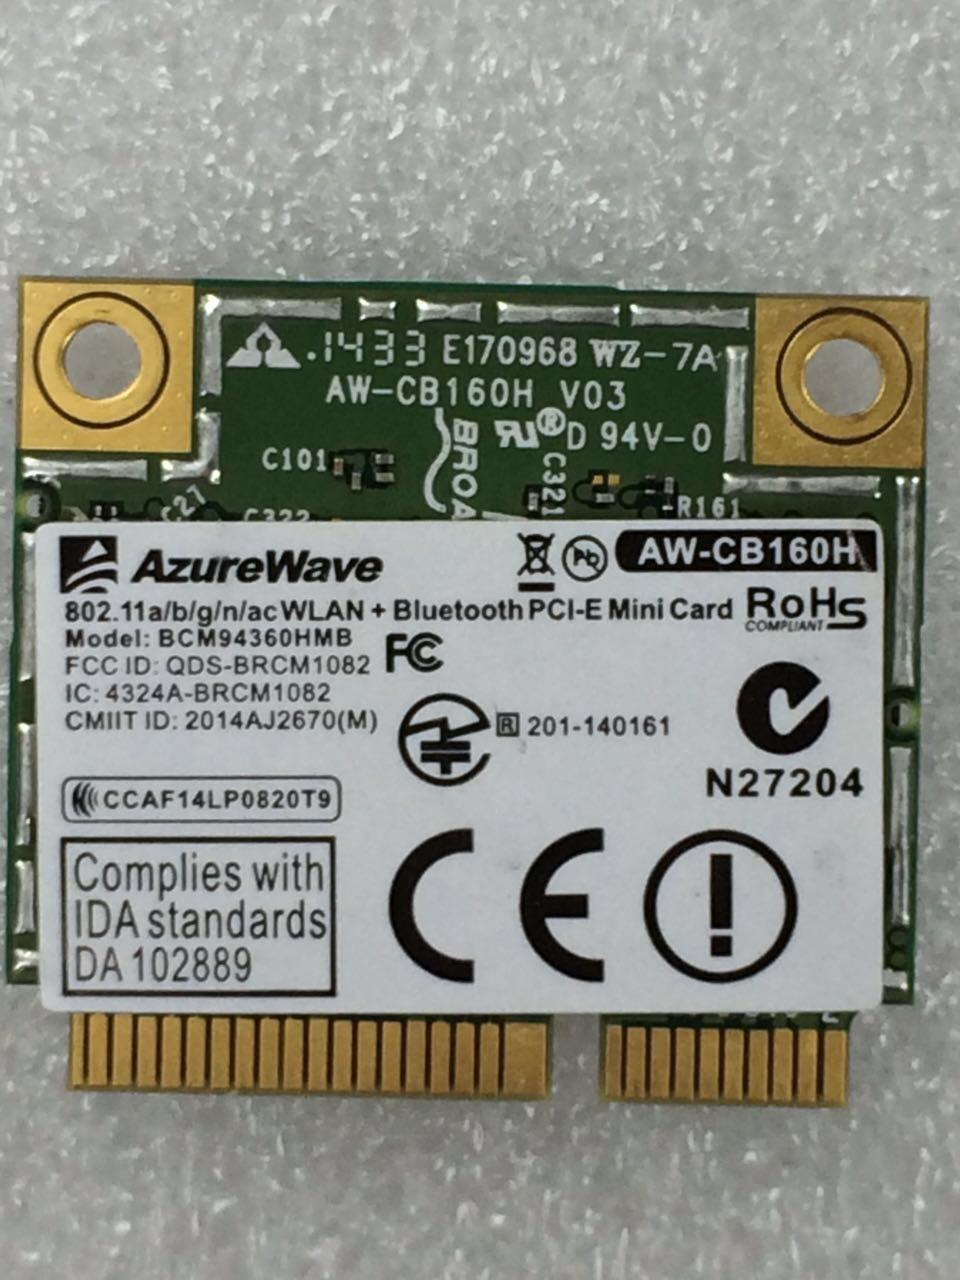 AzureWave AW-CB160H BCM94360HMB BCM94360 medio Mini pci-express Bluetooth4.0 + 802.11AC 867Mbps tarjeta Wifi WLAN inalámbrica